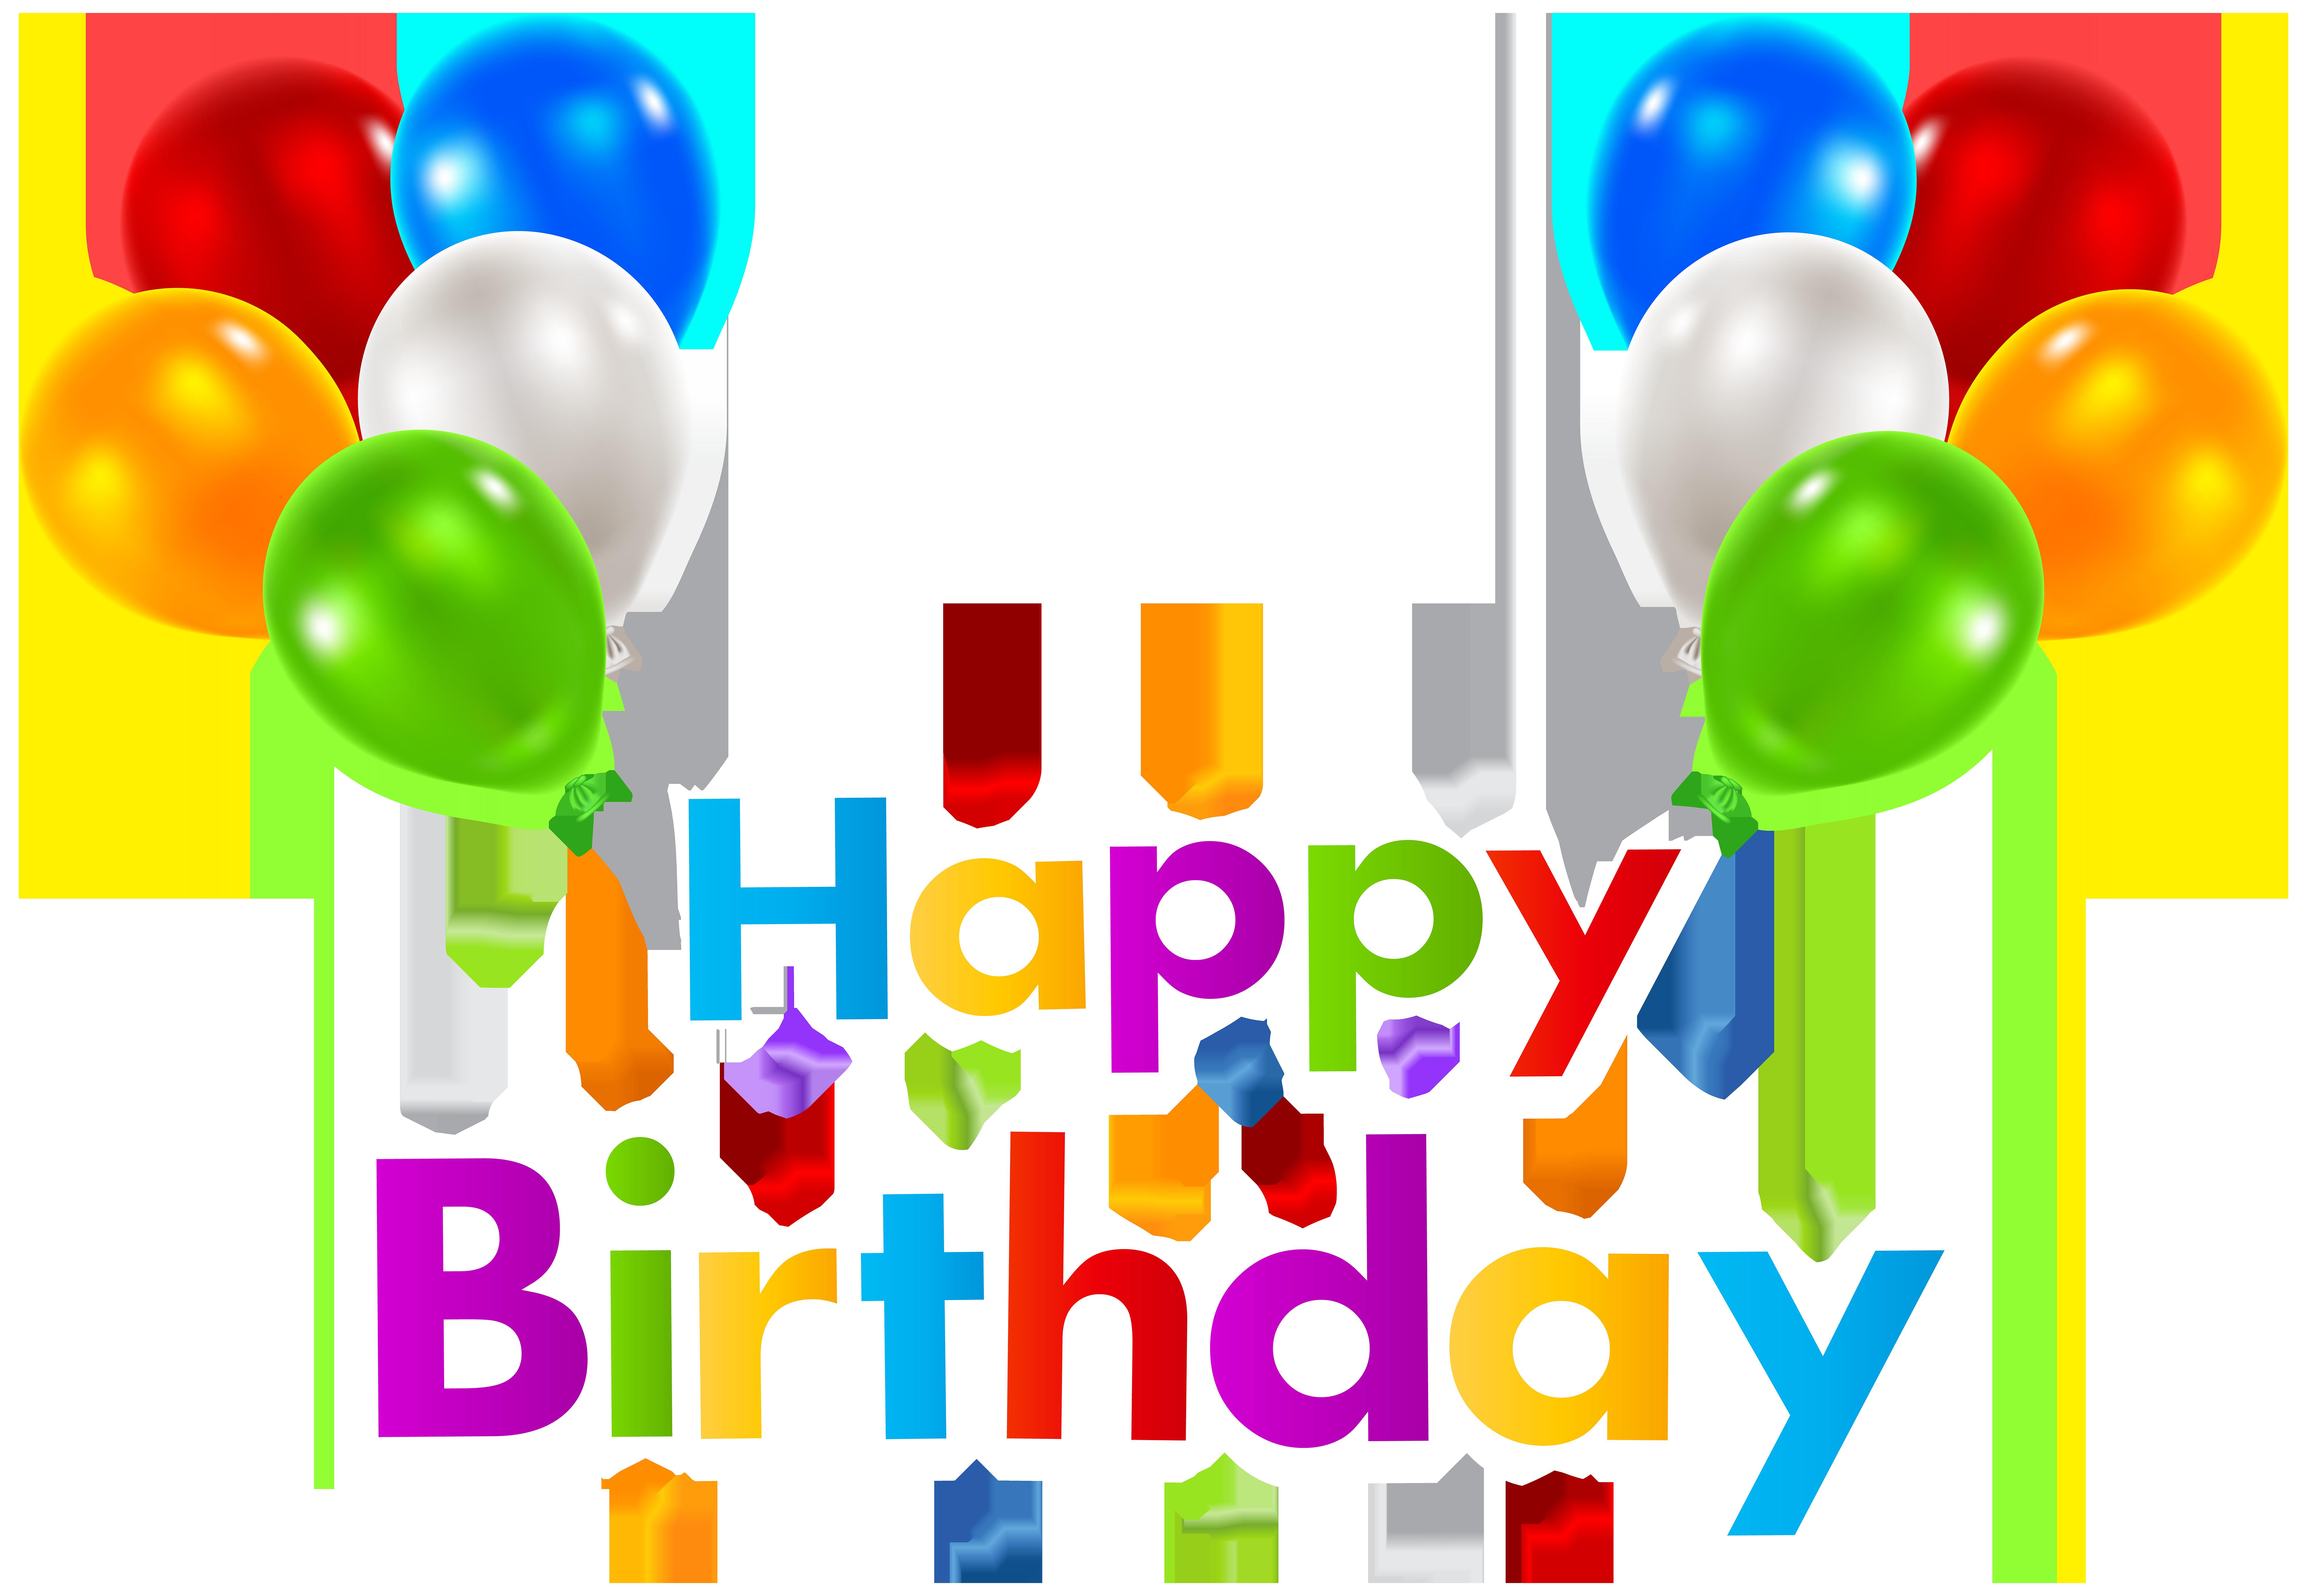 Pin by digital effect on Birthday | Happy birthday banners